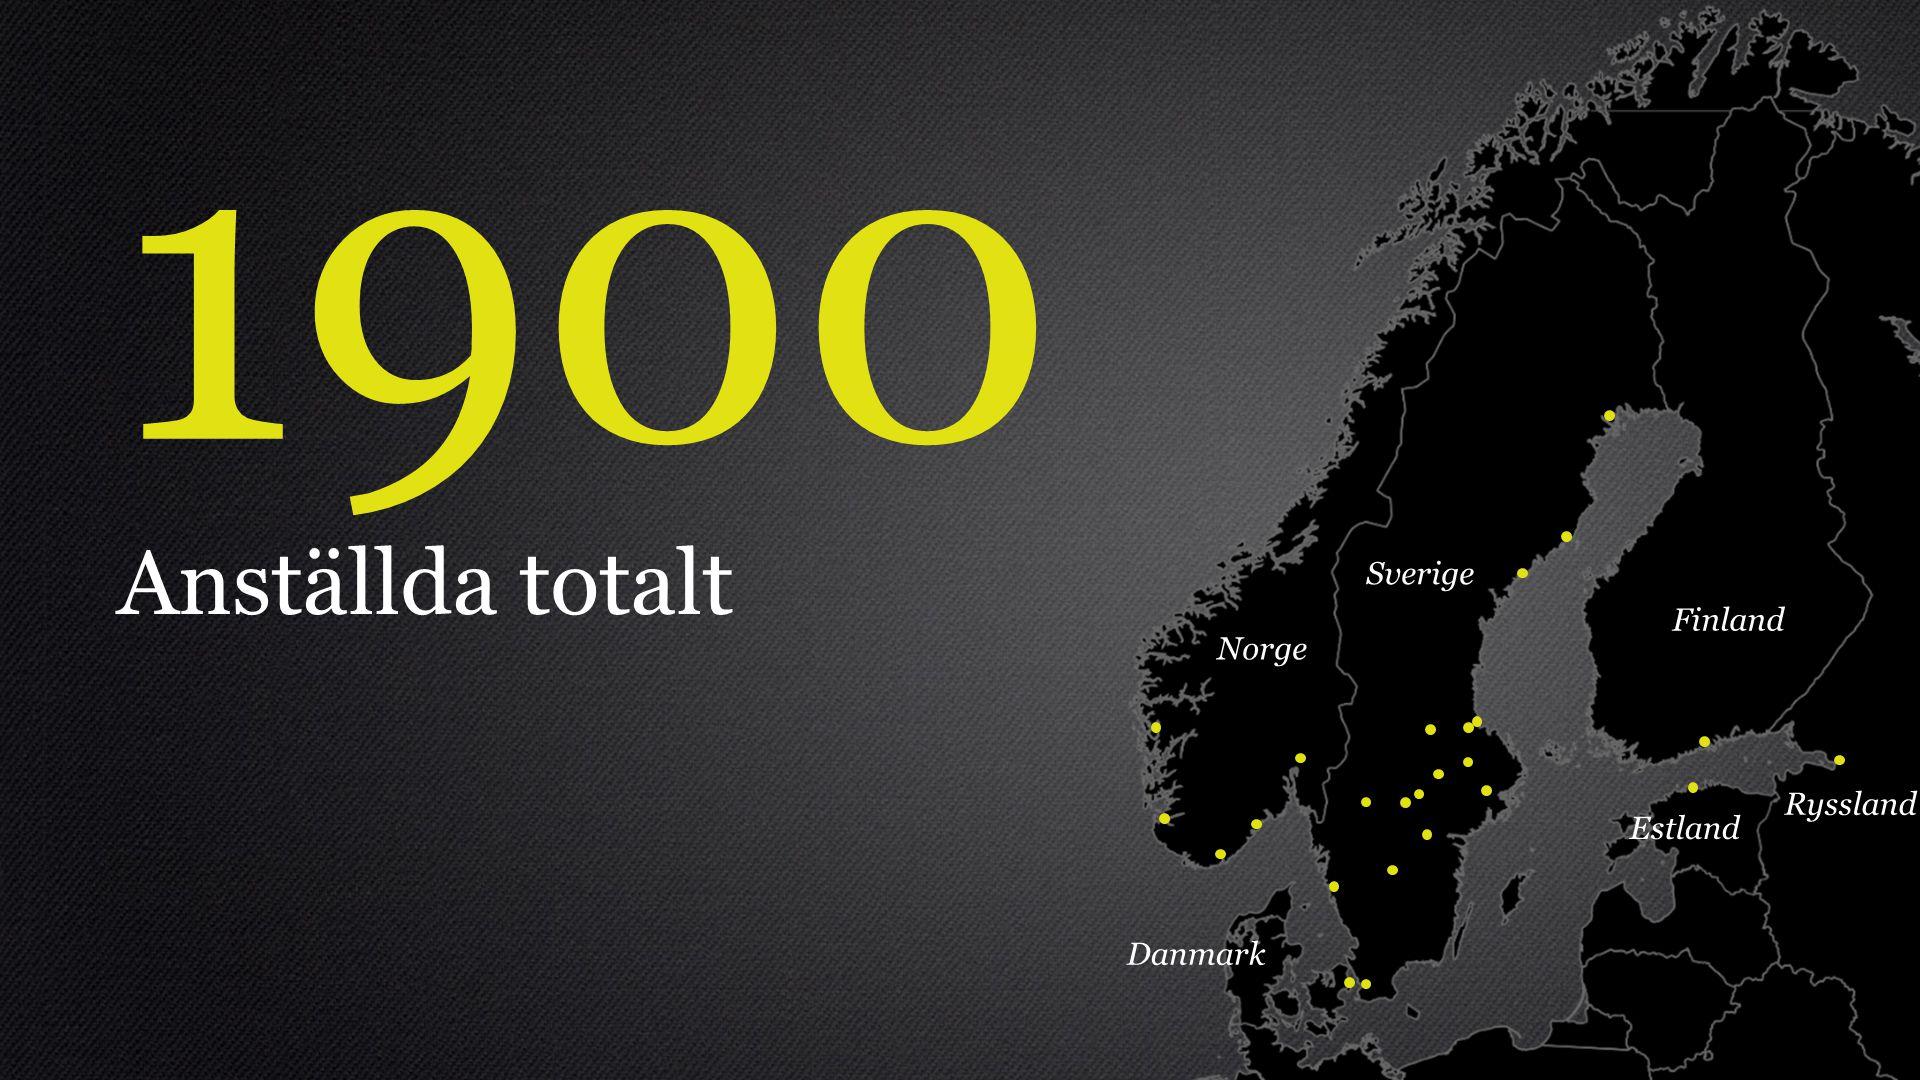 1900 Anställda totalt Sverige Norge Finland Danmark Estland Ryssland